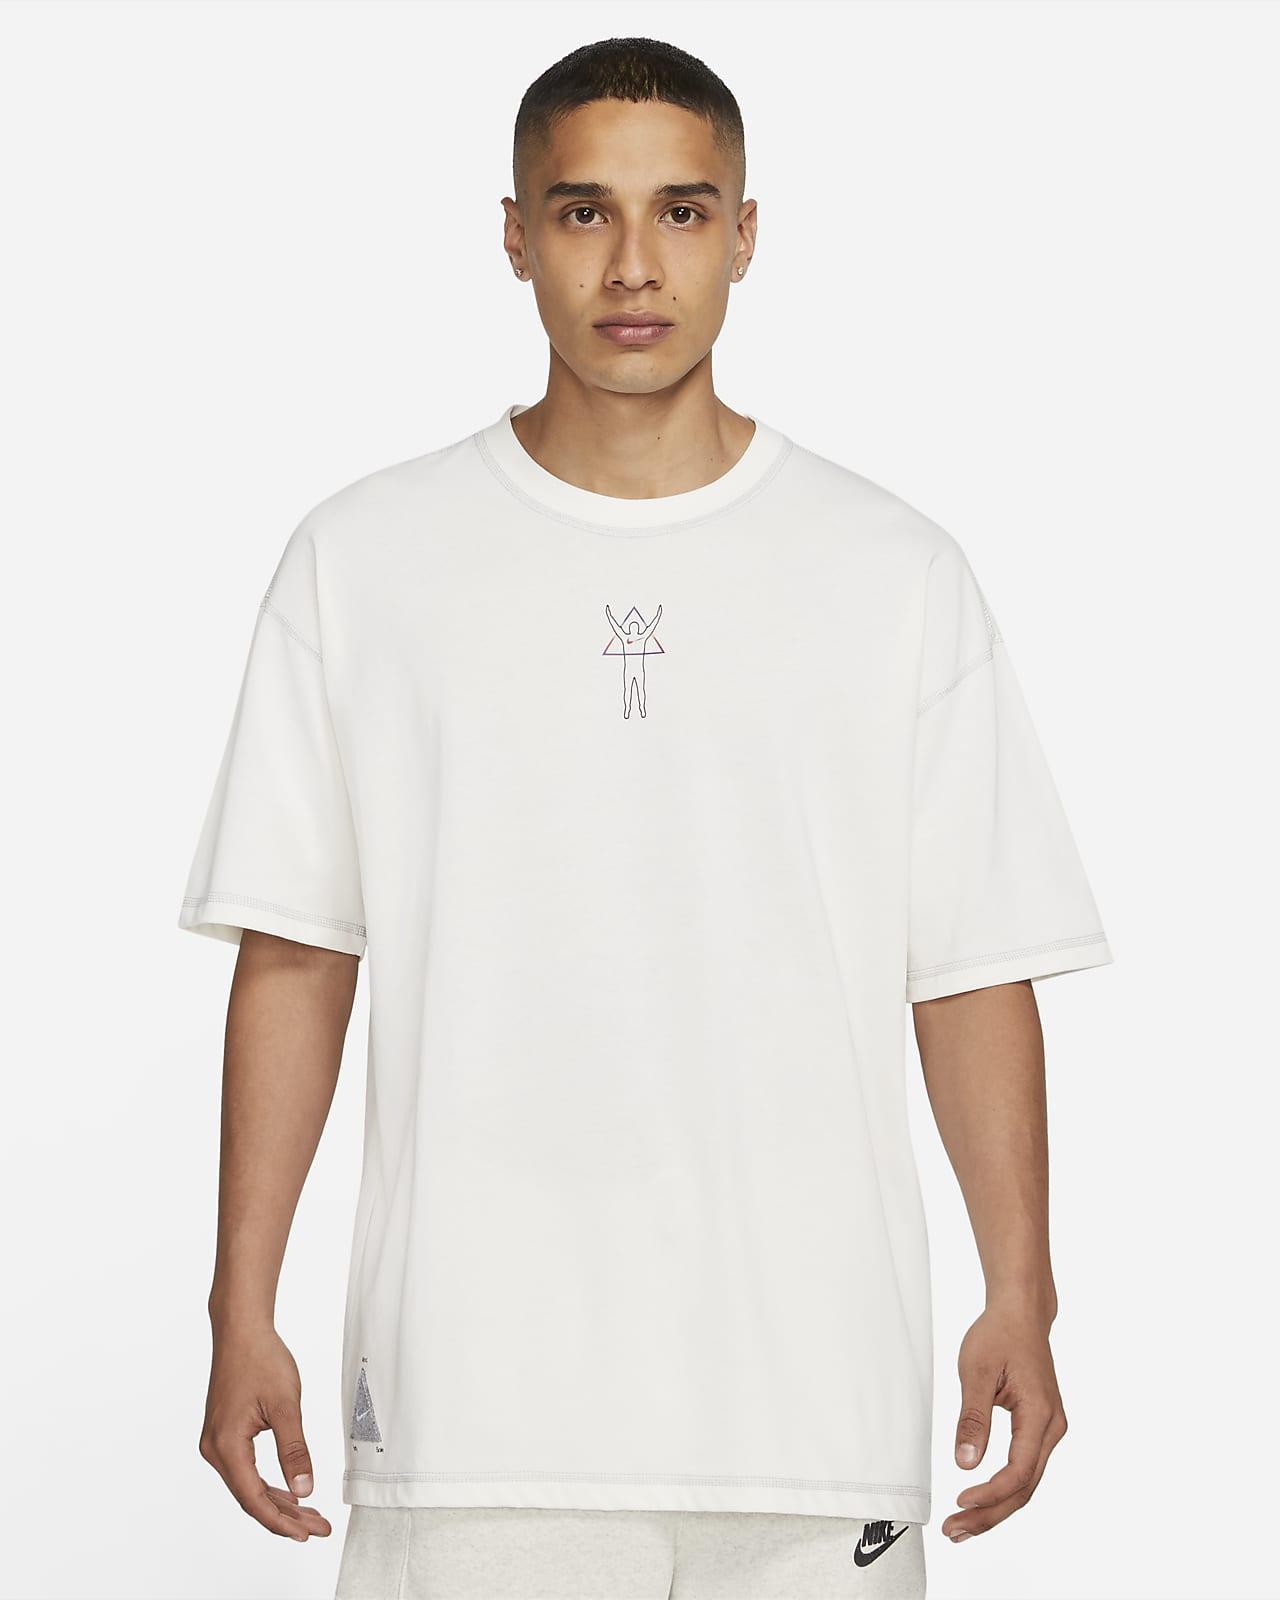 Nike Sportswear T-shirt voor heren